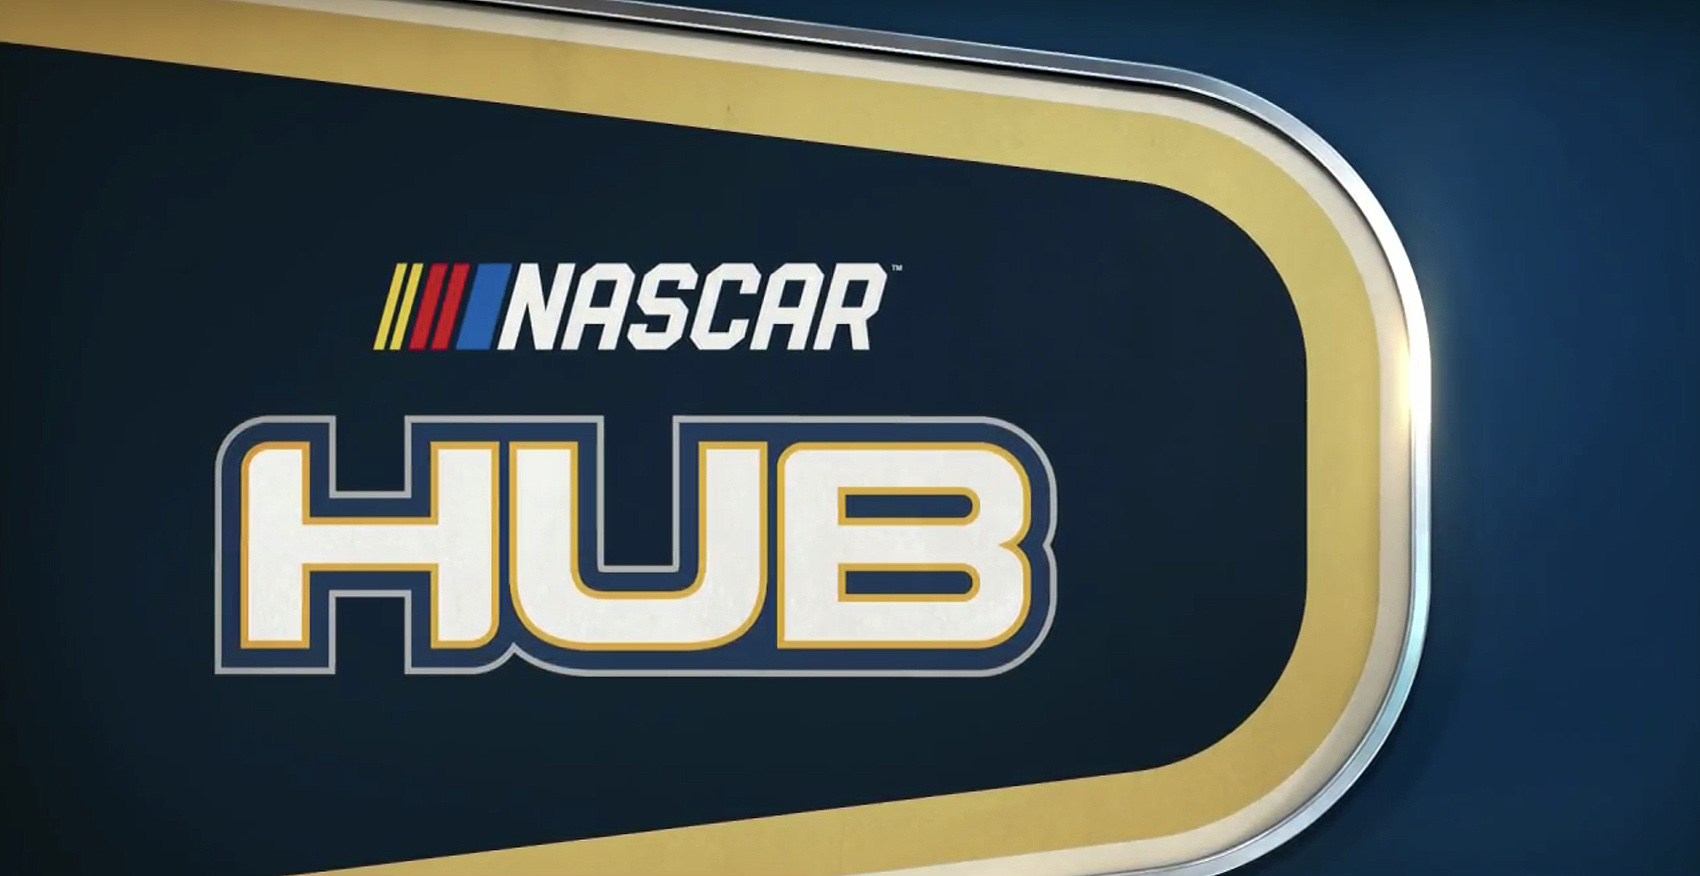 NCS_NASCAR-Fox-2019-Broadcast-Design_021